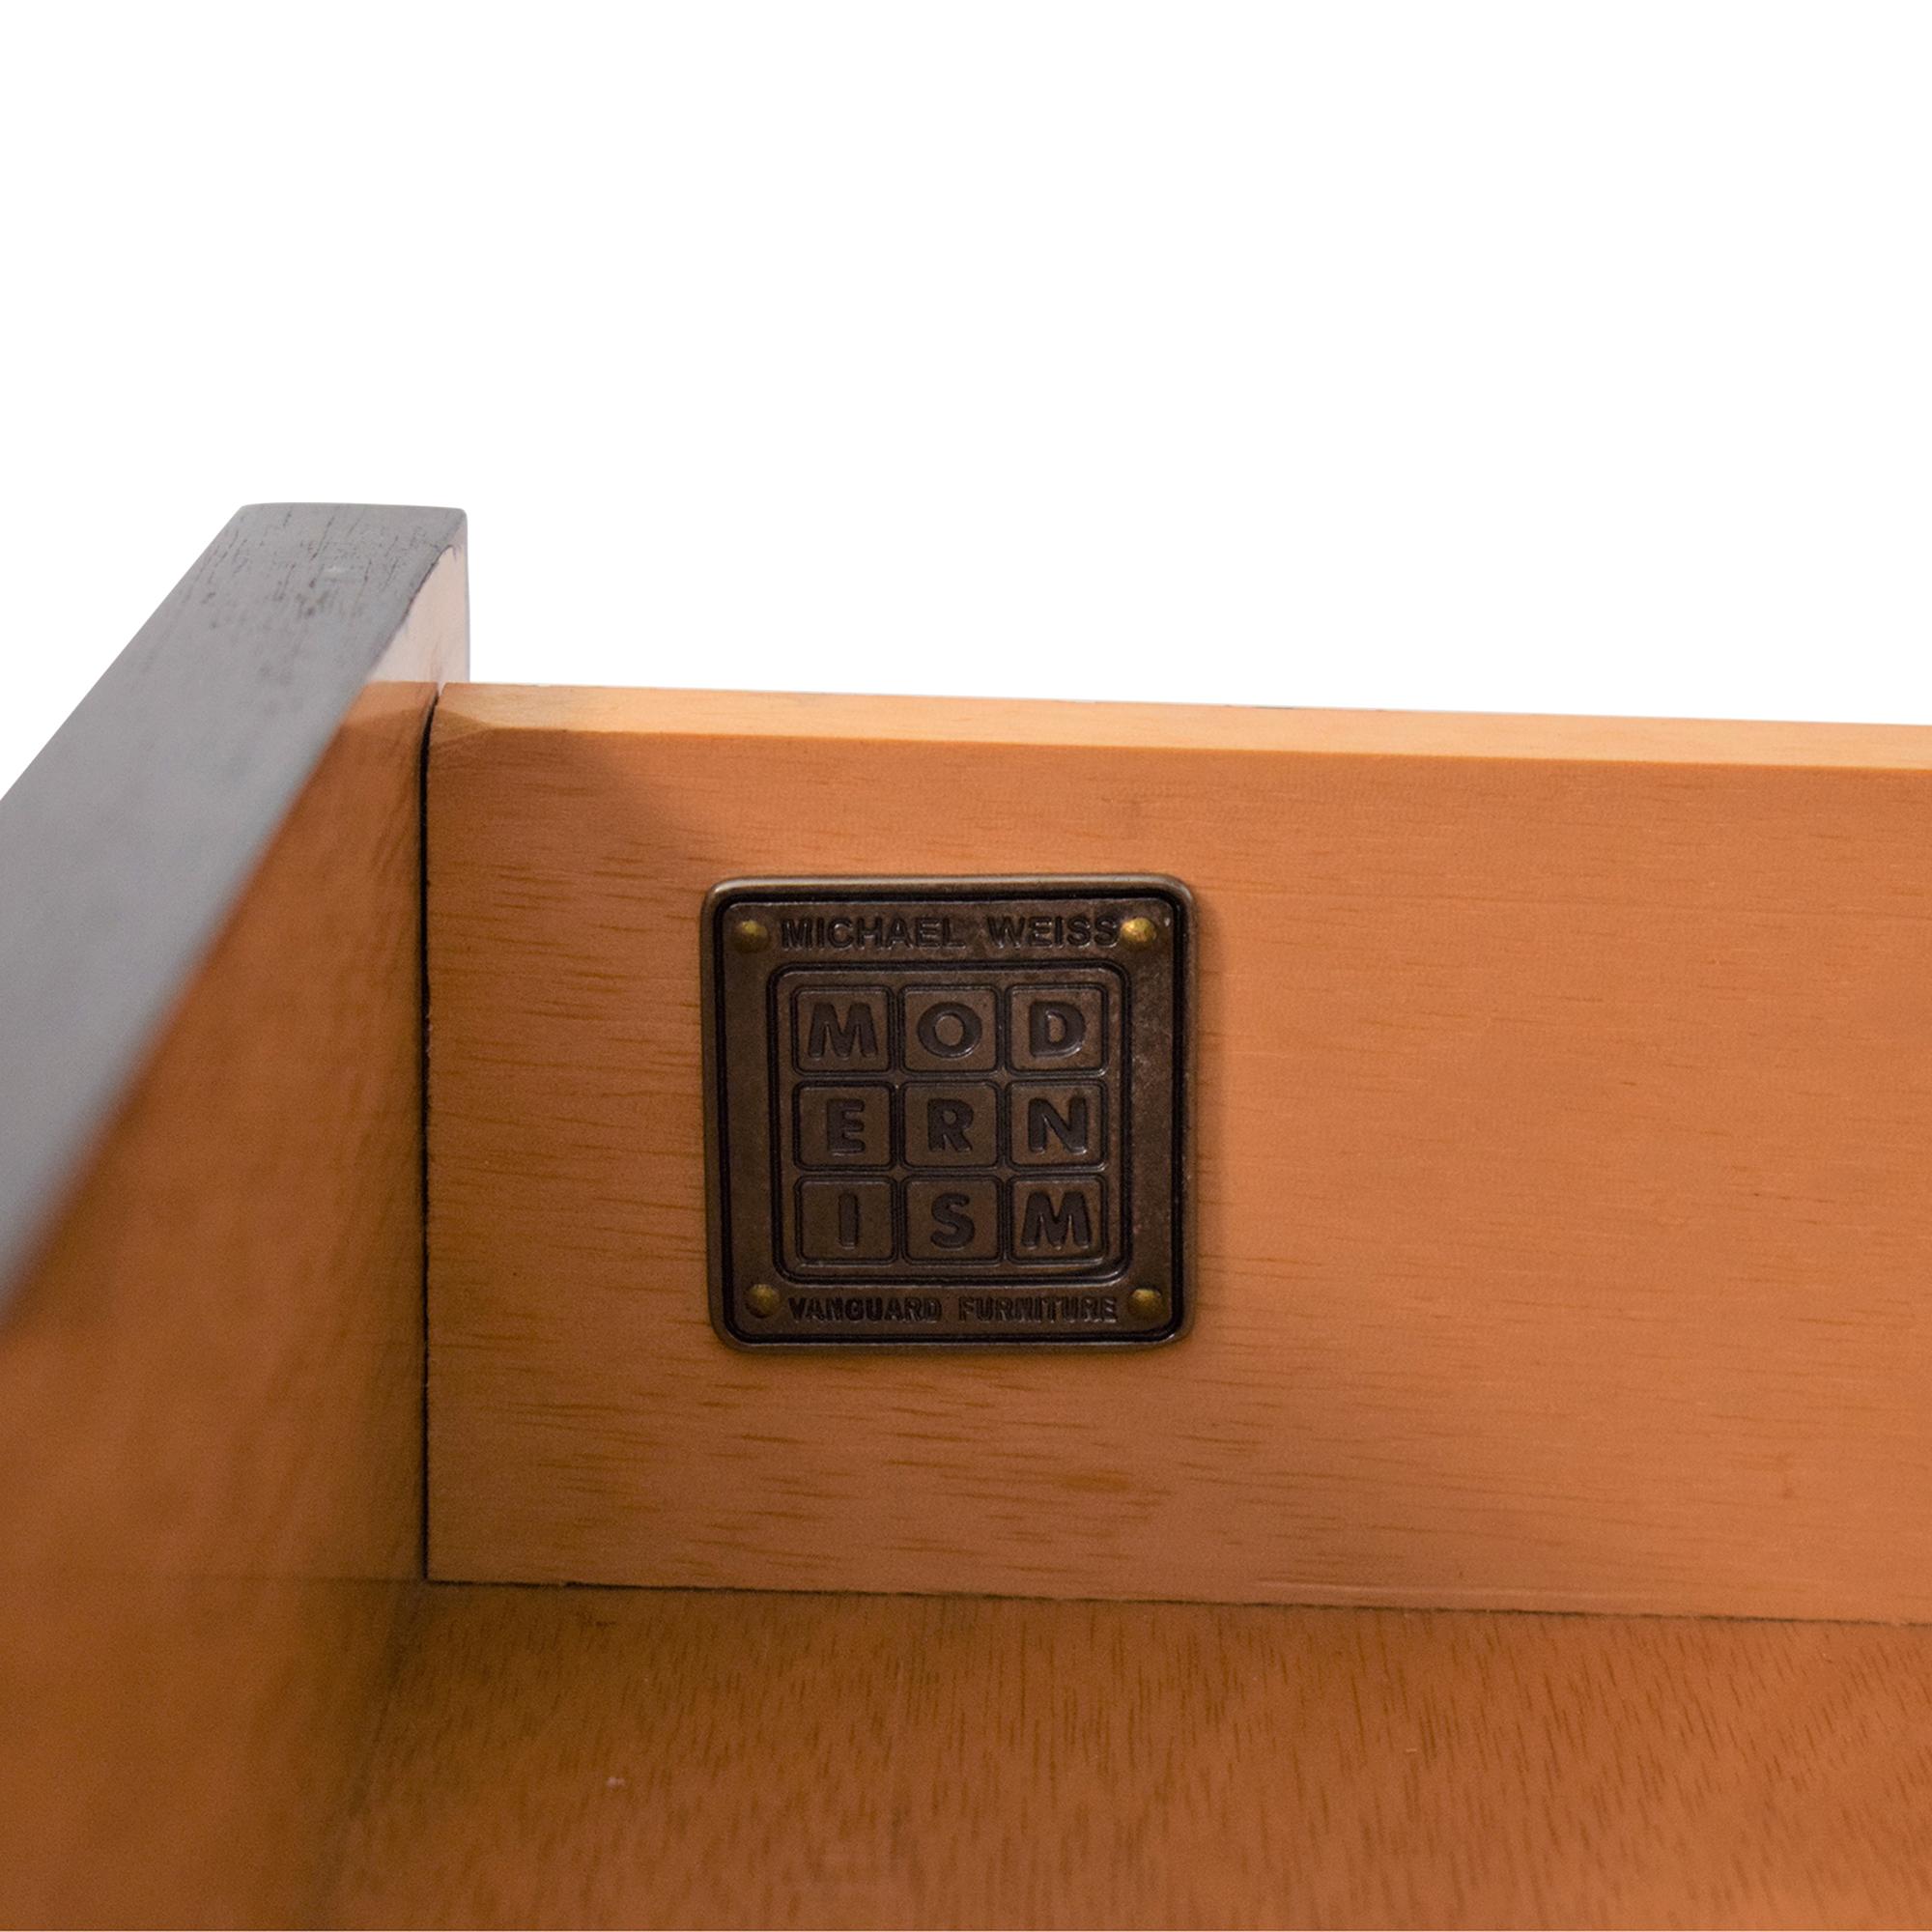 Vanguard Furniture Michael Weiss Modernism by Vanguard Furniture Wood Eterge used